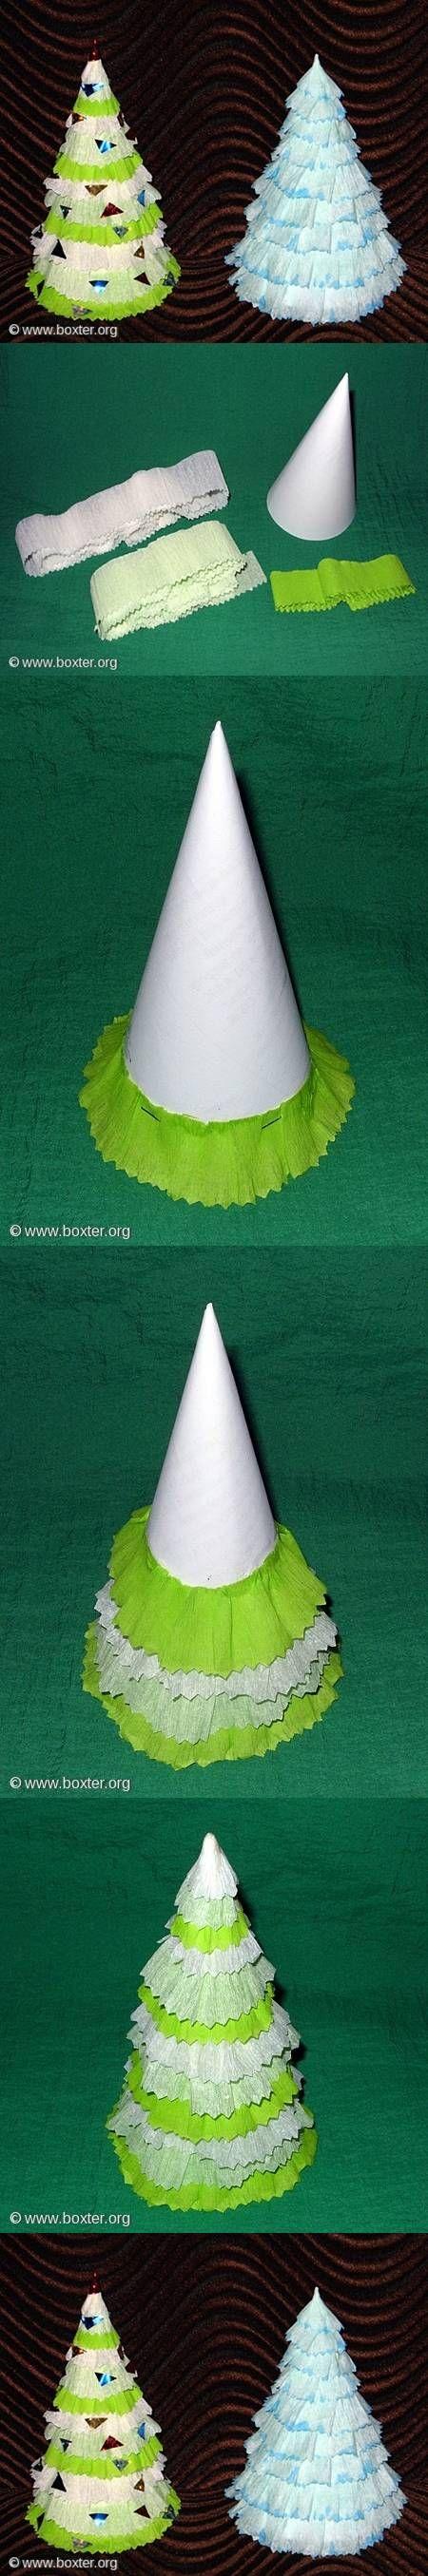 DIY Crepe Paper Christmas Tree DIY Projects | UsefulDIY.com Follow Us on Facebook ==> http://www.facebook.com/UsefulDiy